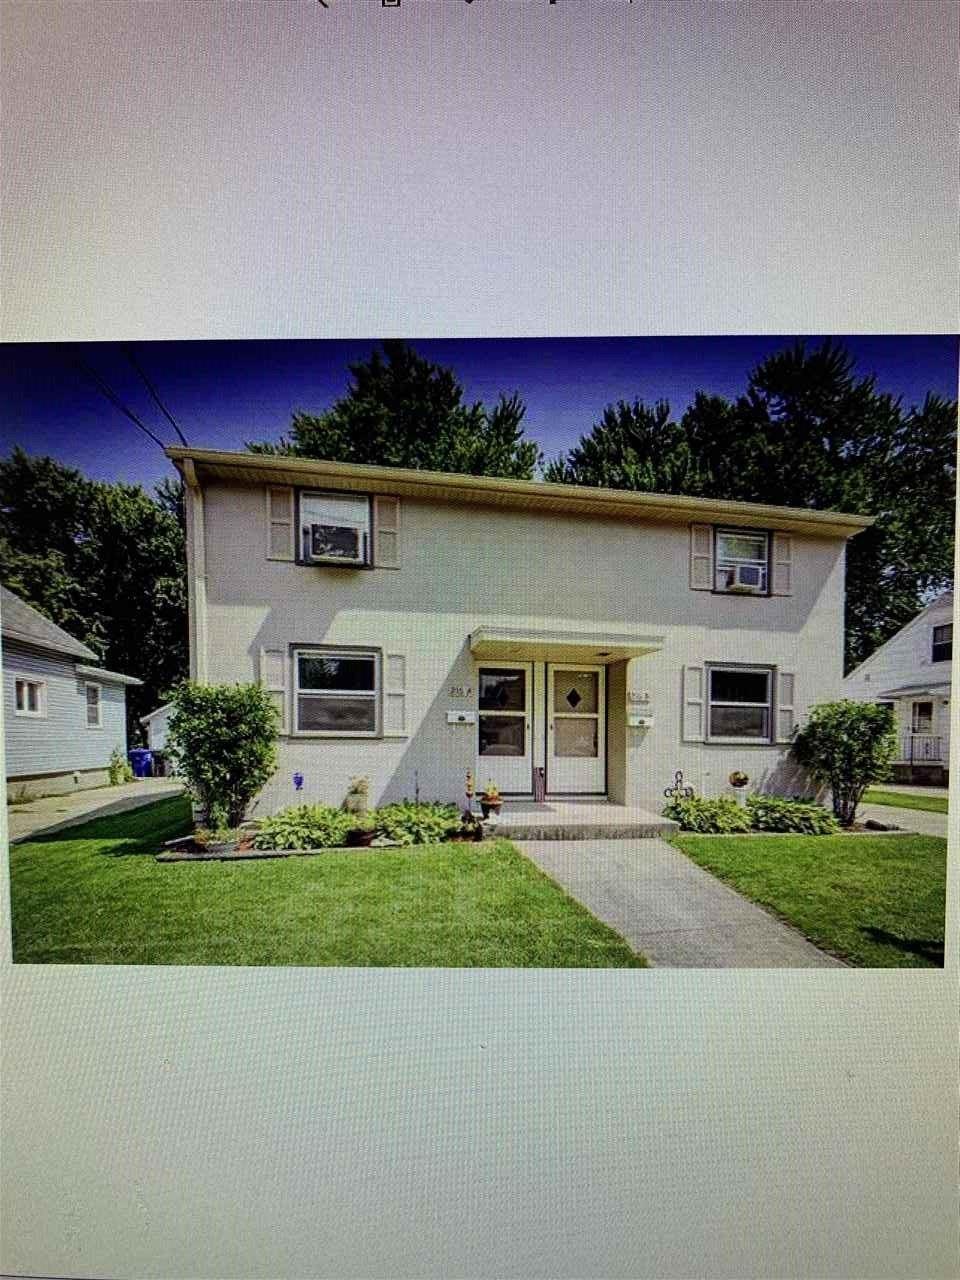 216 TAYLOR Street, Little Chute, WI 54140 - MLS#: 50227120